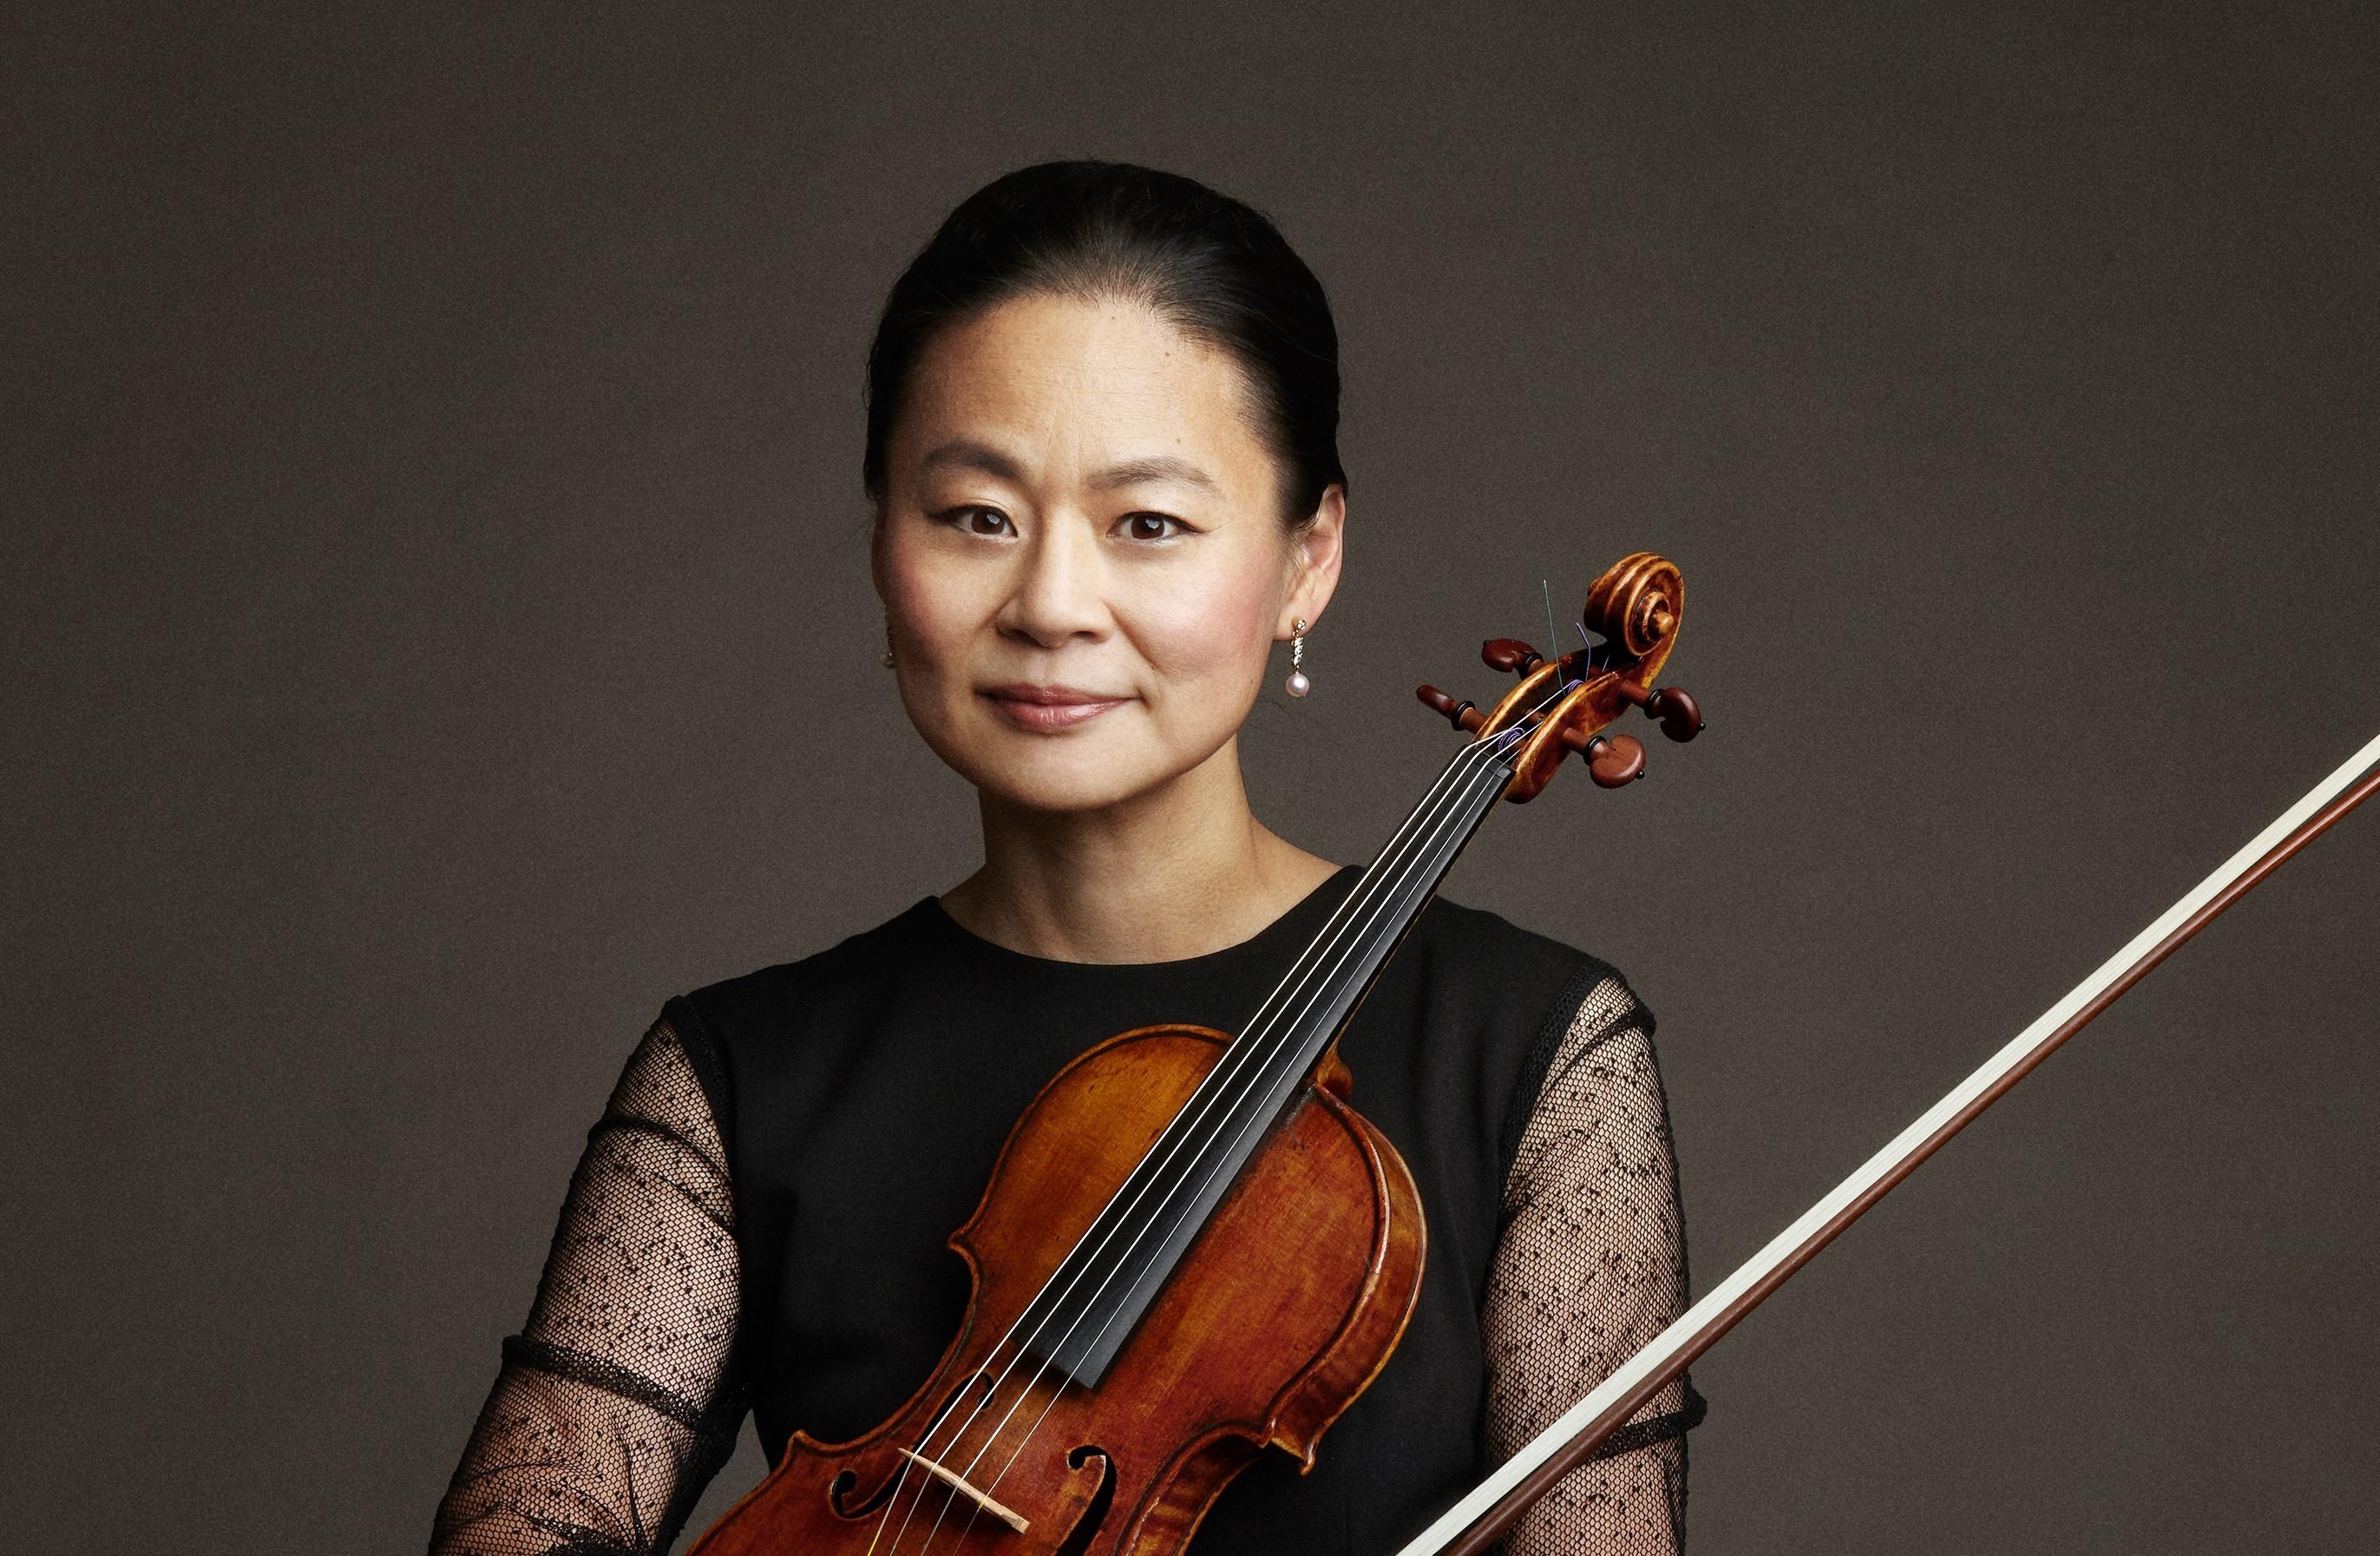 Brahms-Preis 2020